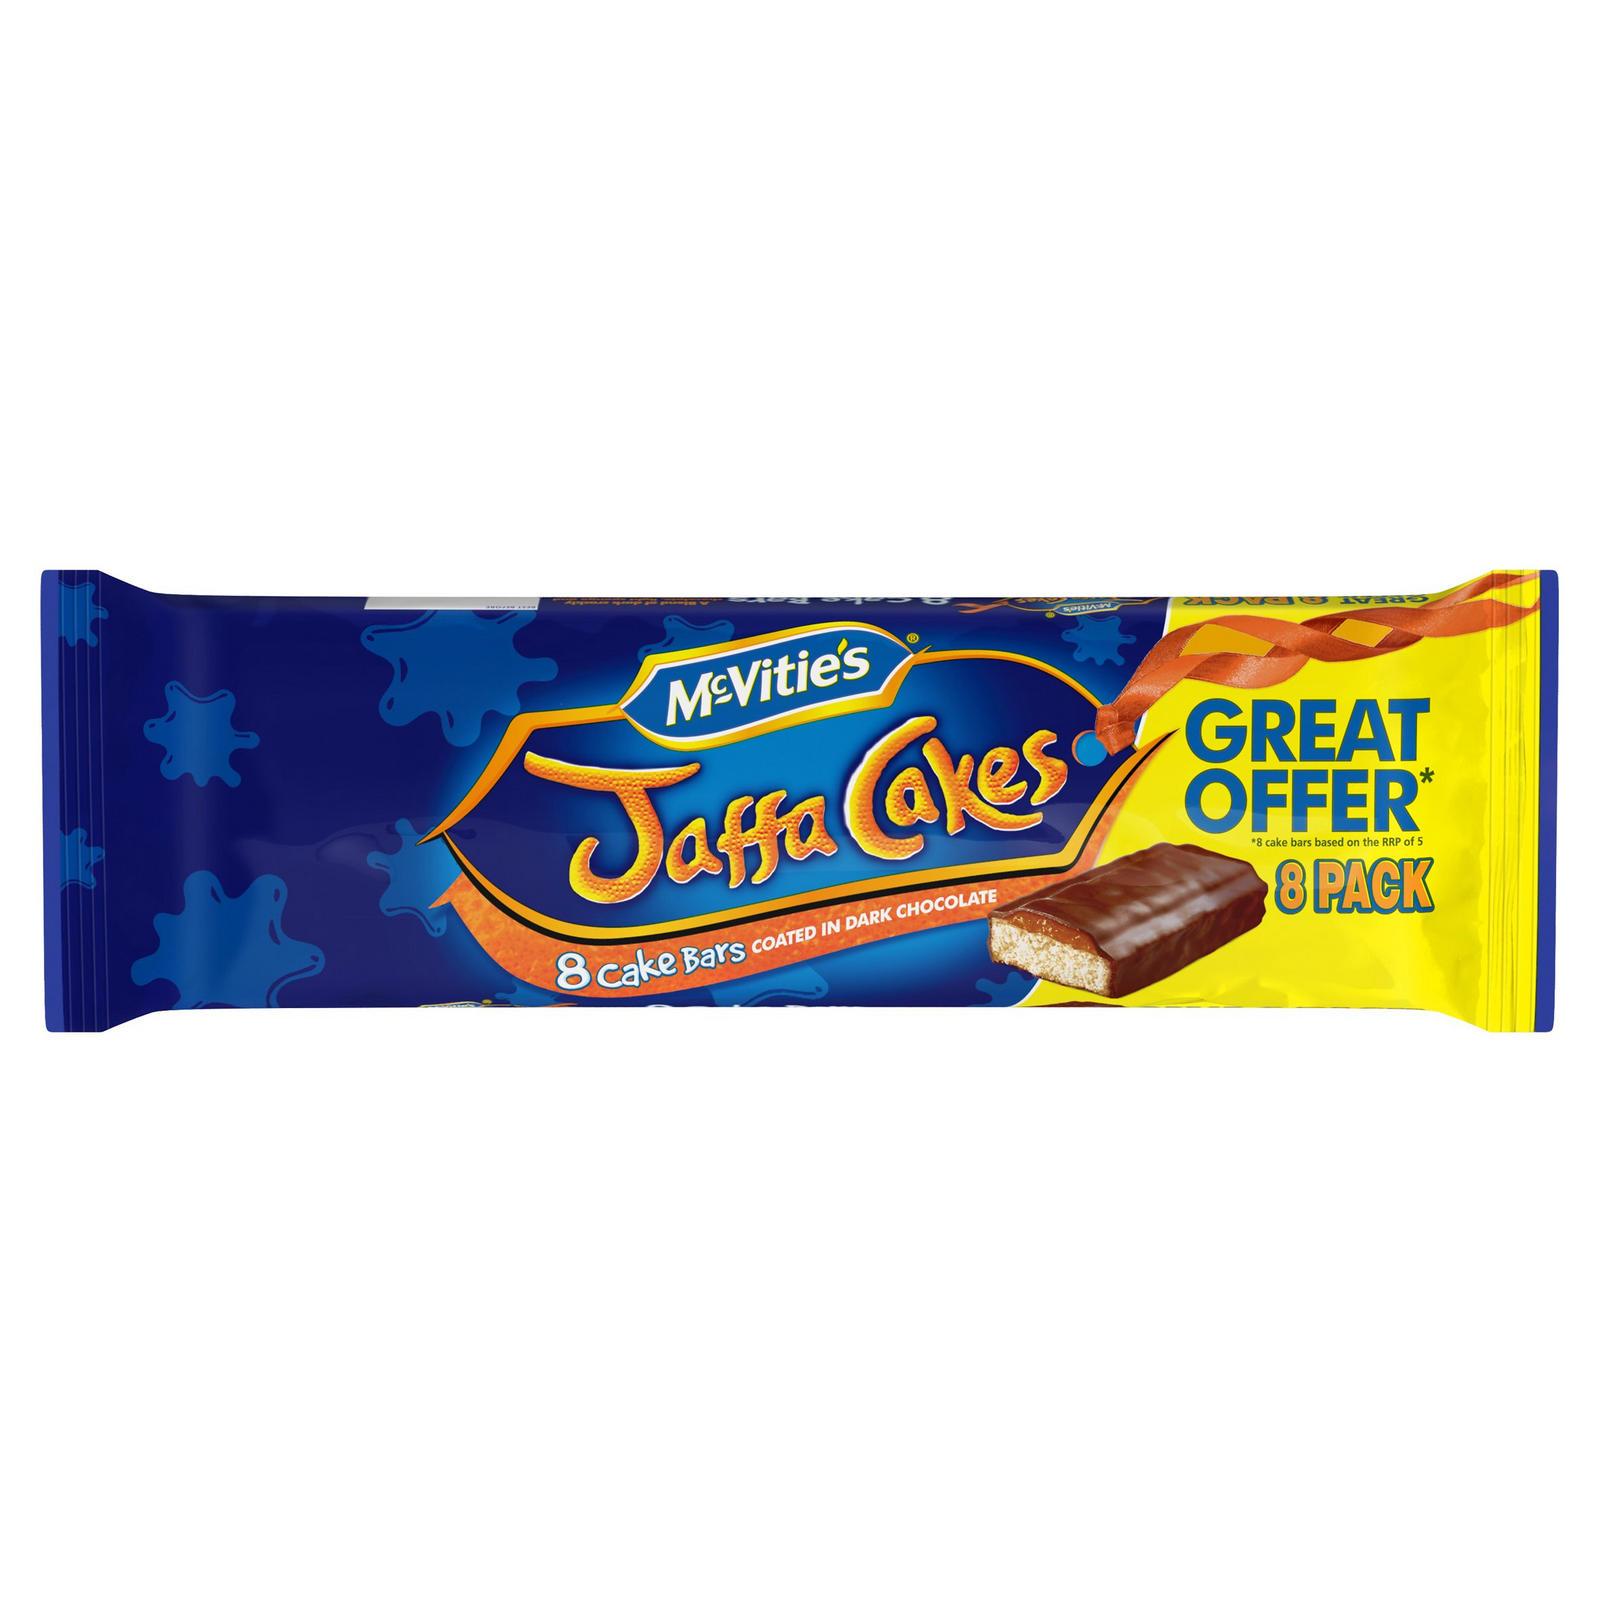 8 McVitie's Jaffa Cake Bars £1 at Heron Foods Abbey Hulton